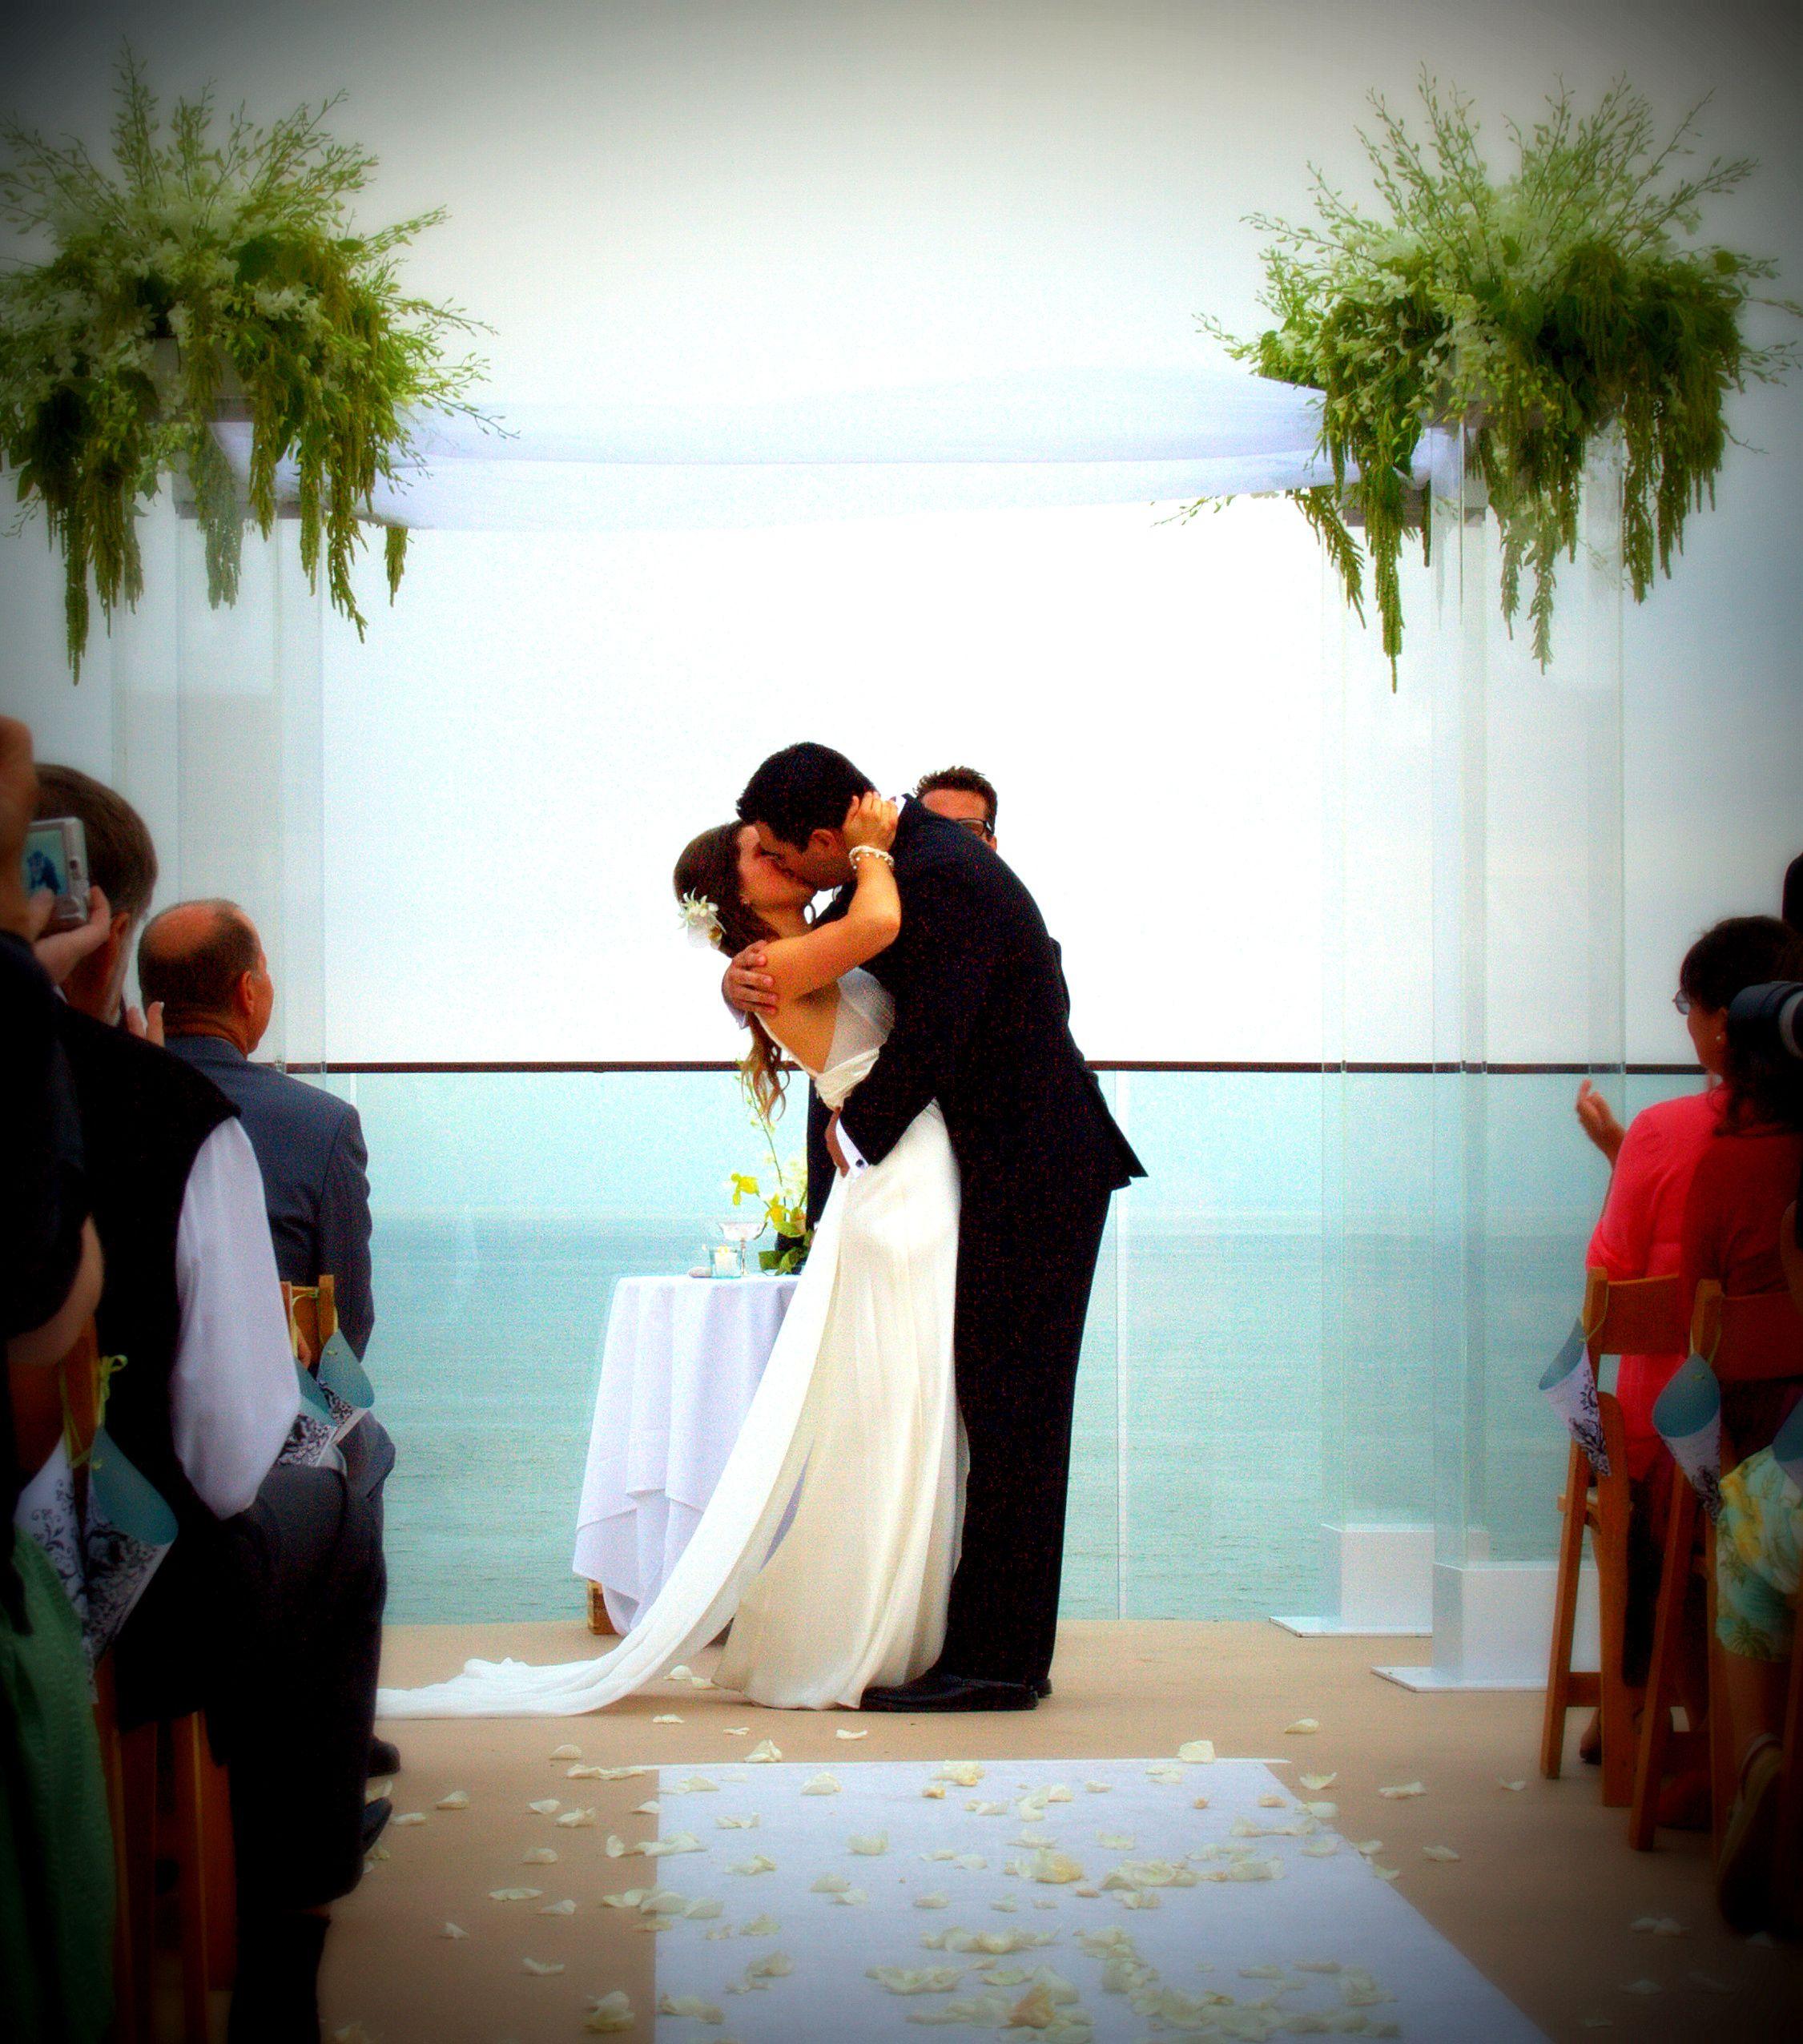 Arcylic Wedding Chuppah RentalsLucite Wedding Canopy RentalsClear Wedding Canopy Rentals & Arcylic Wedding Chuppah RentalsLucite Wedding Canopy Rentals ...